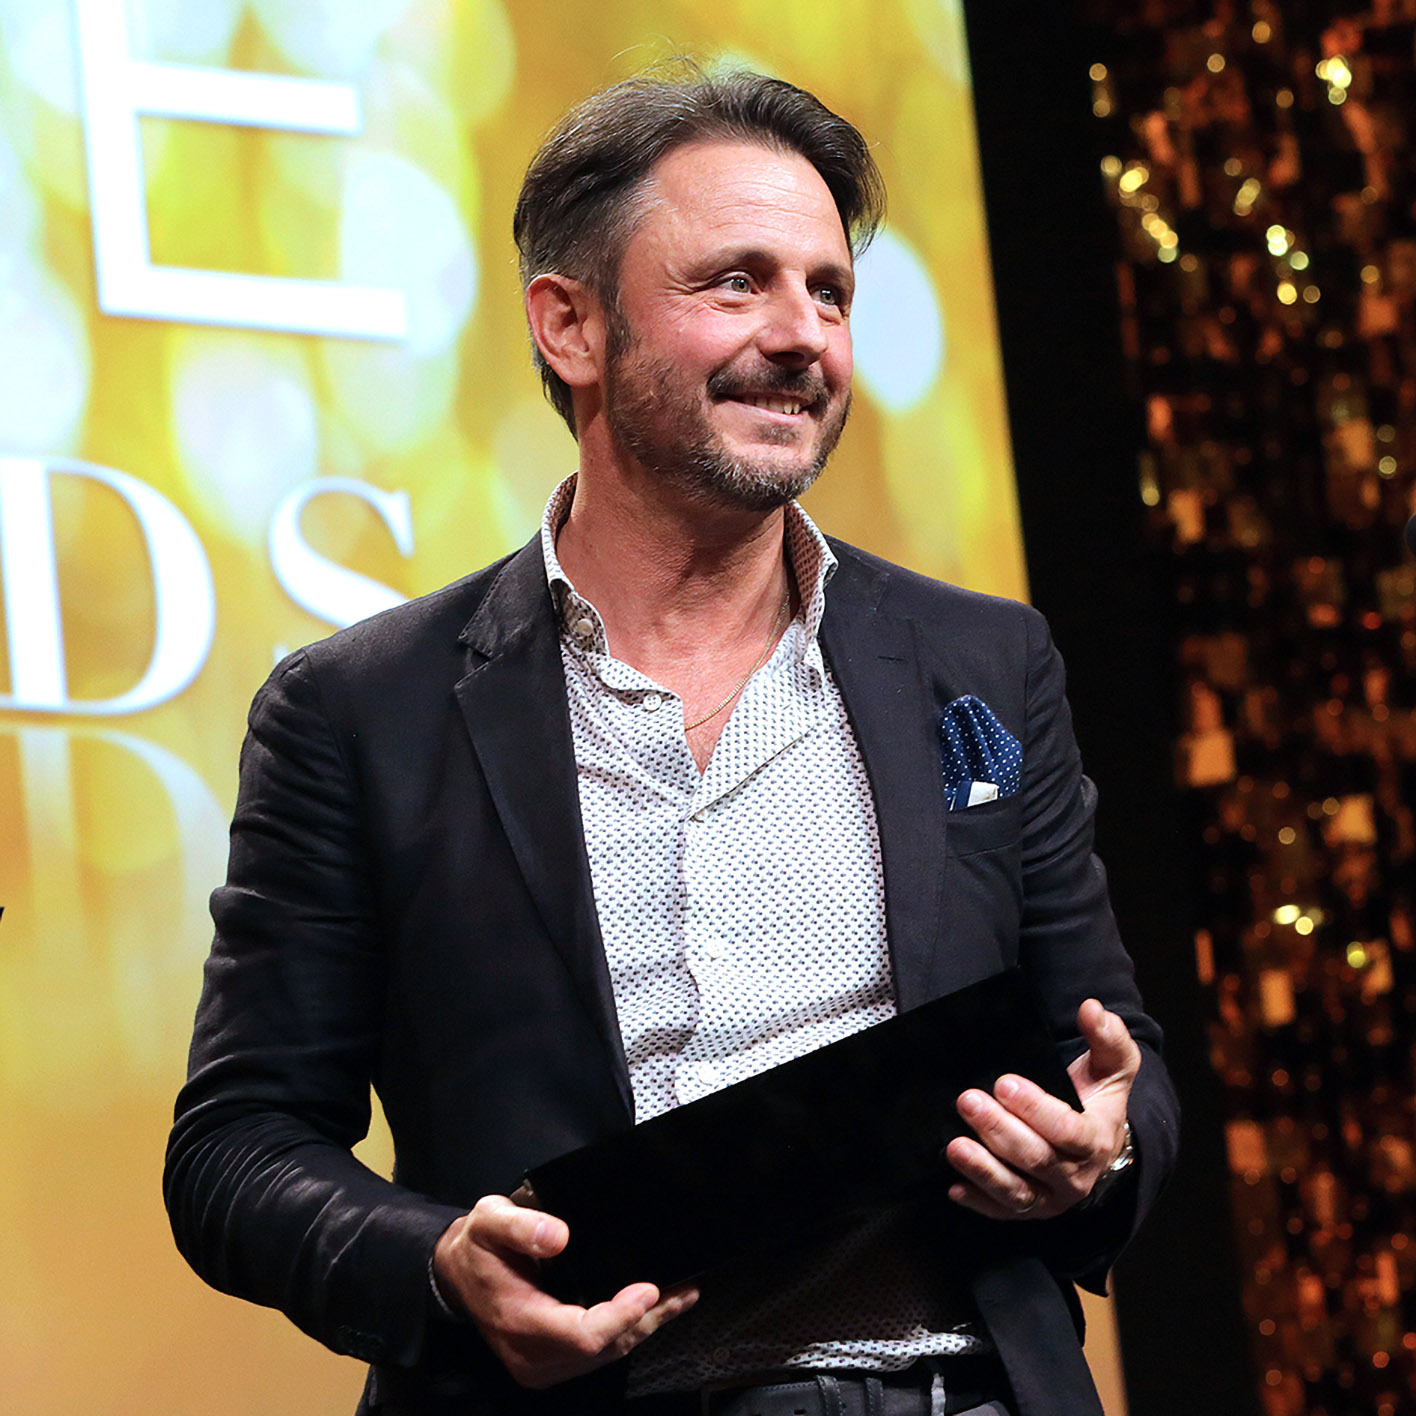 Massimo Gismondi ritira il premio People's Choice Award 2019, sul palco di Las Vegas.